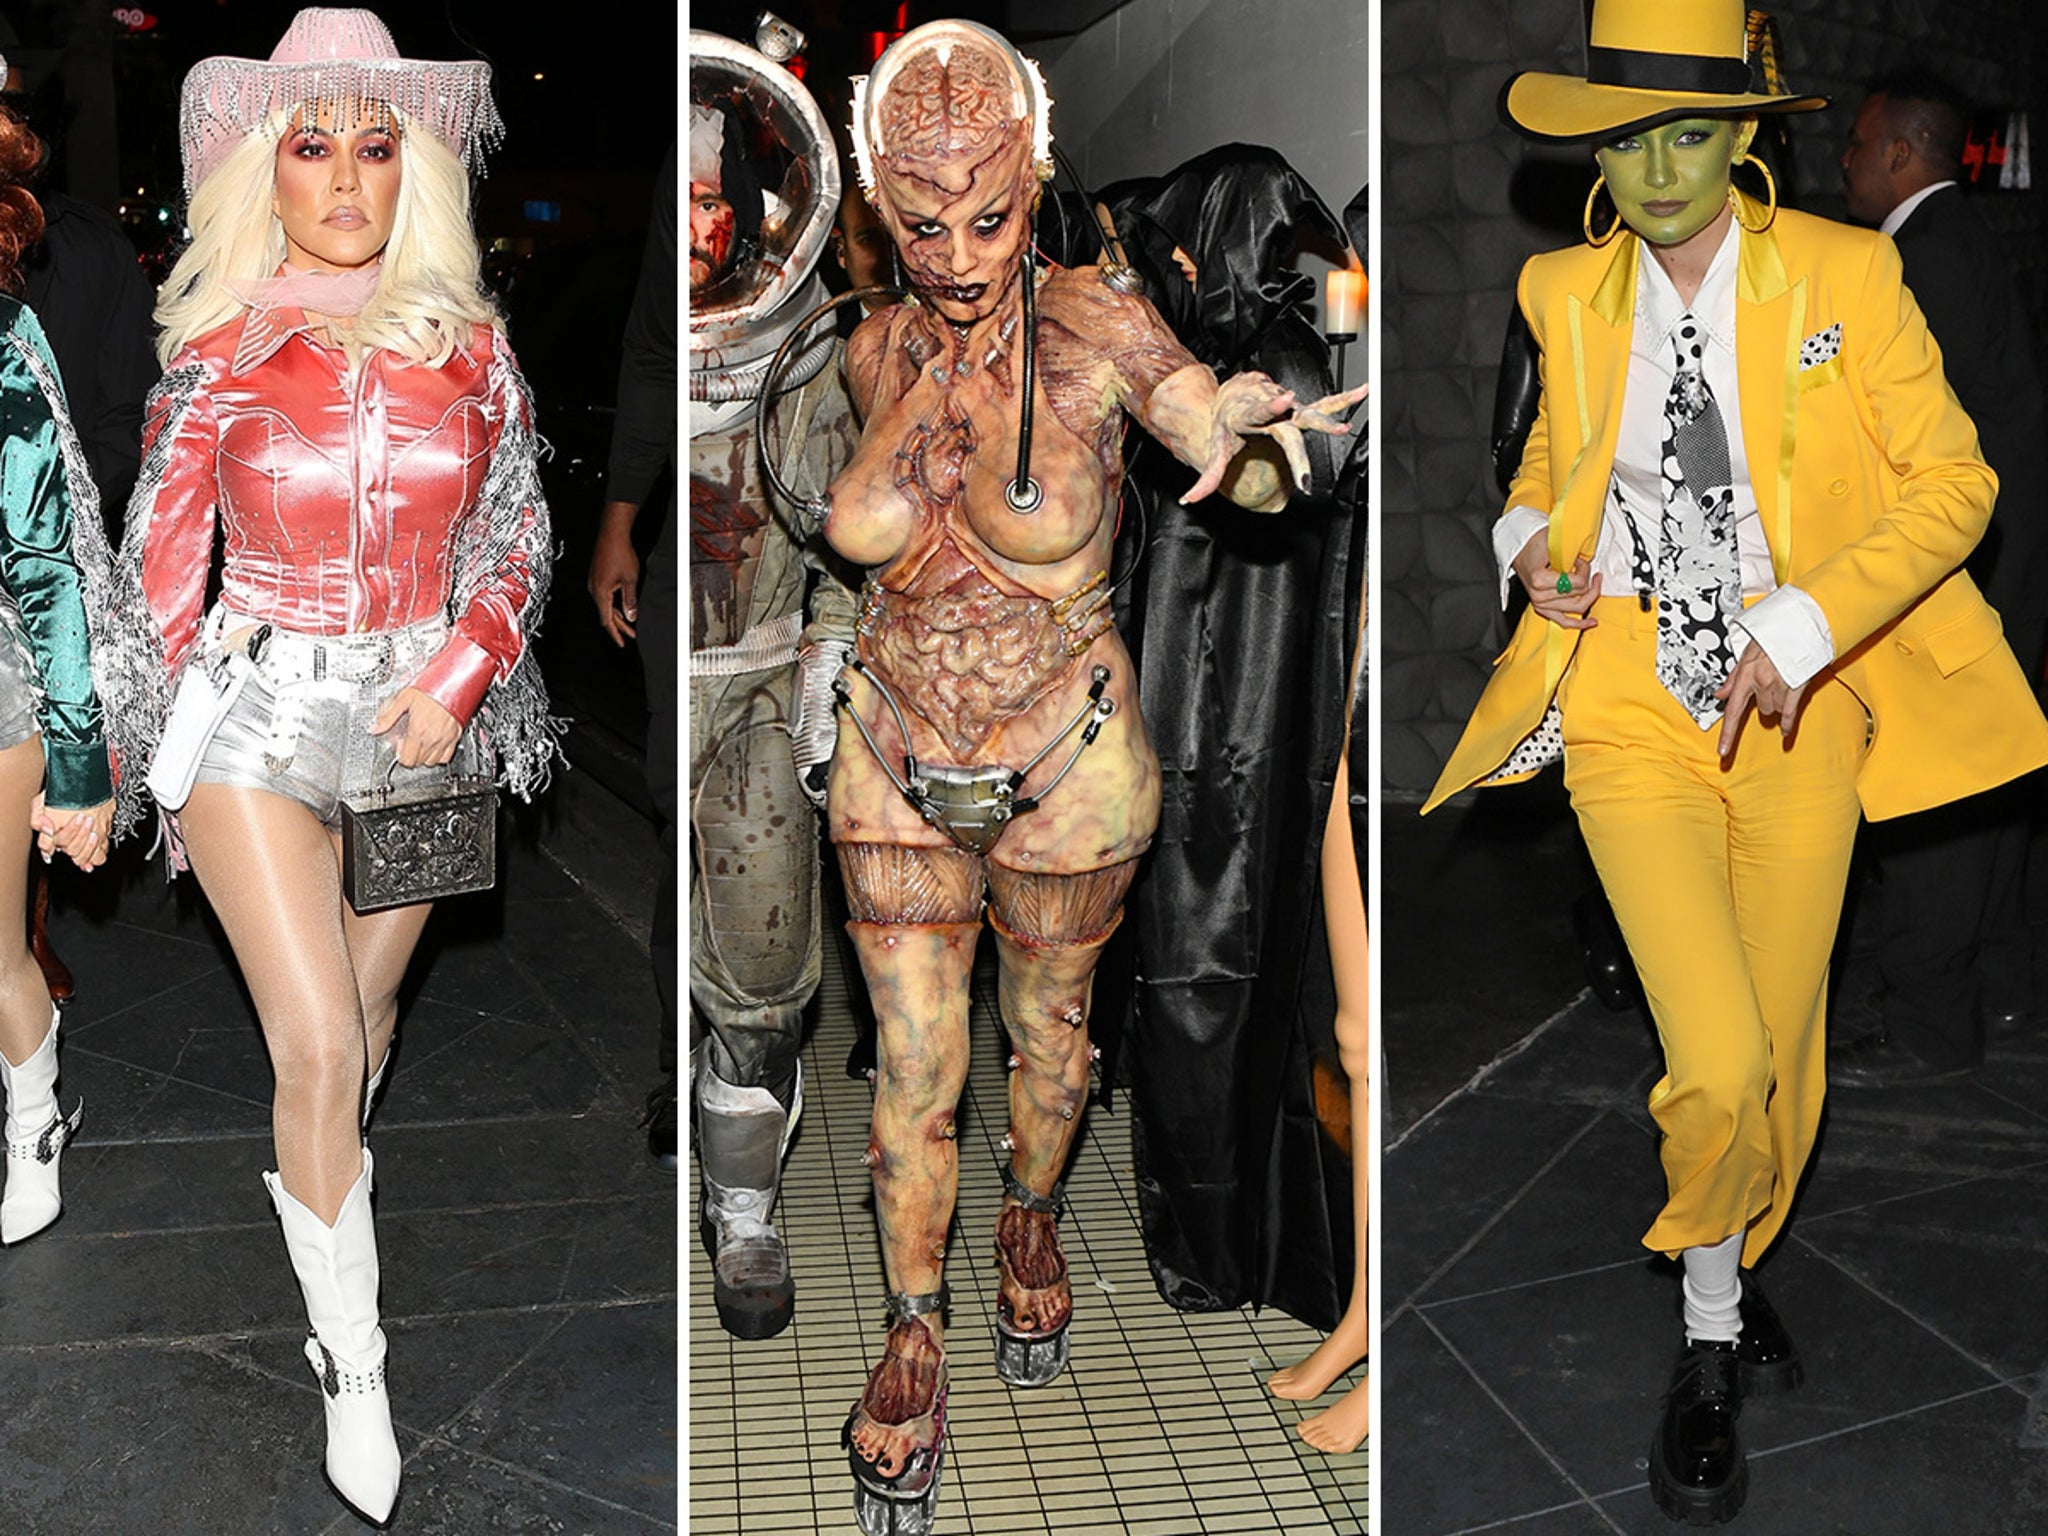 Heidi Klum Halloween Bash 2020.Heidi Klum Reveals Costume As Celebs Go All Out For Halloween